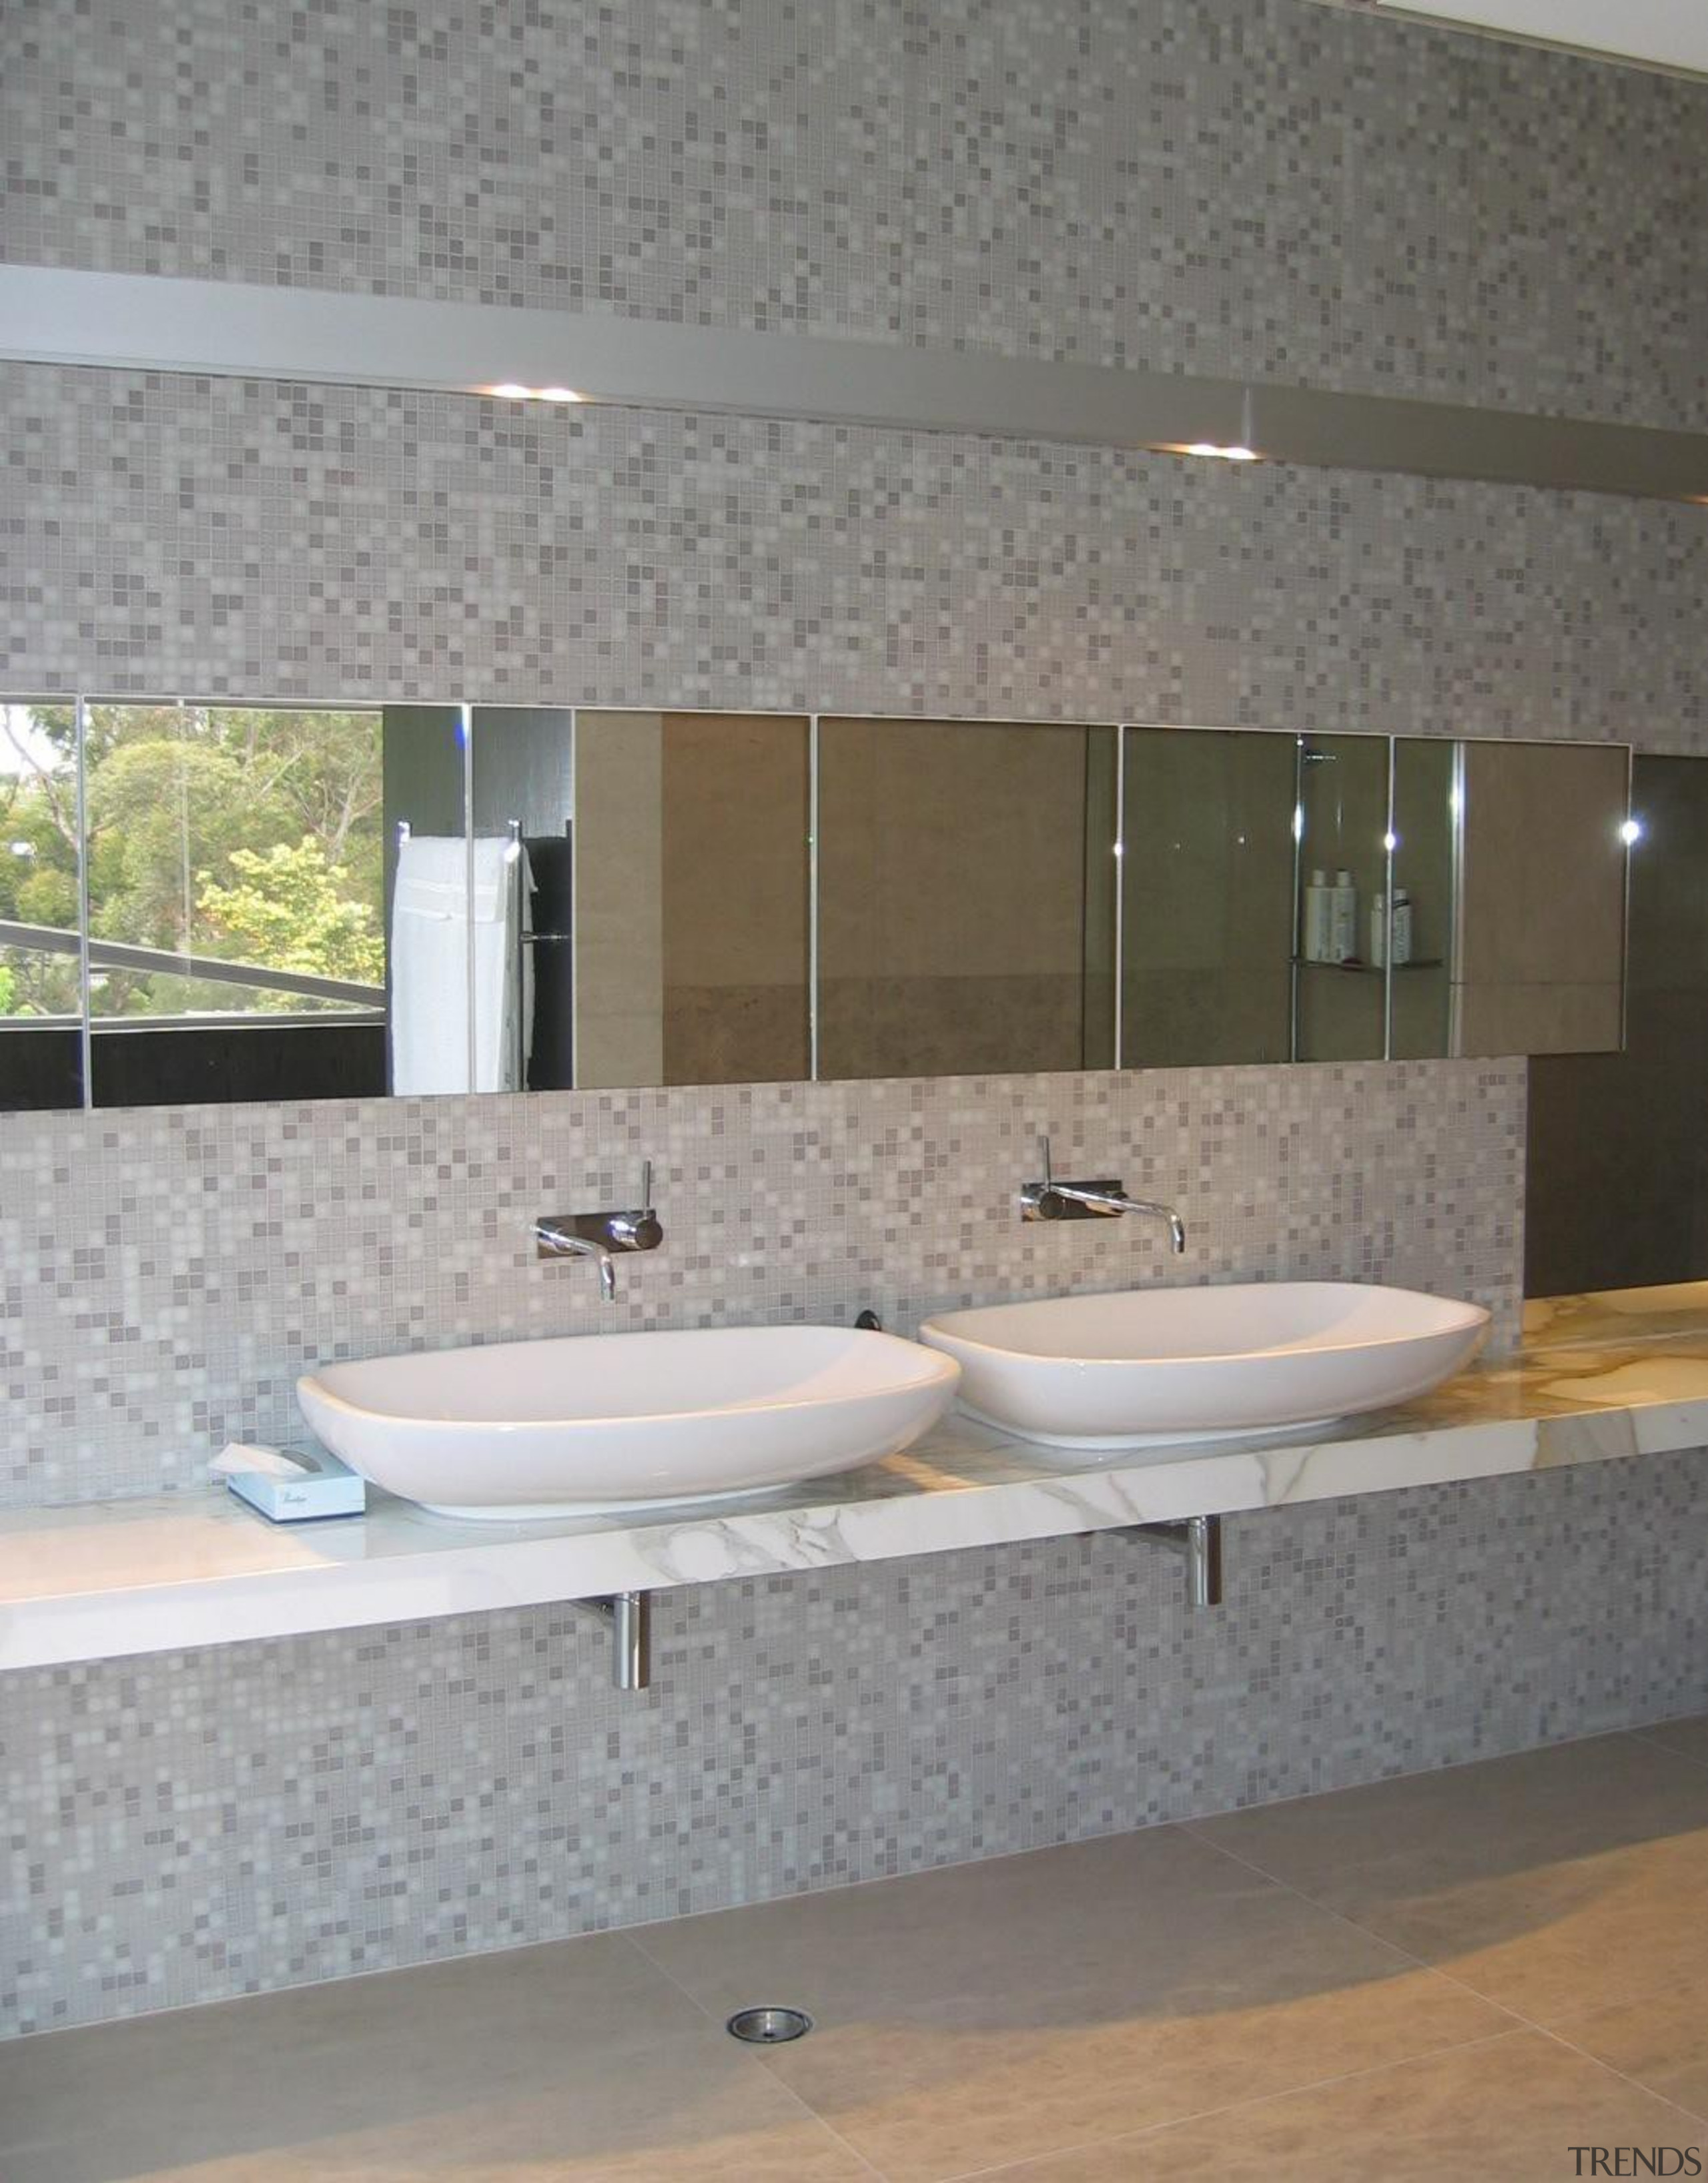 Nuvole wall. - Bisazza Range - architecture | architecture, bathroom, countertop, floor, interior design, plumbing fixture, property, sink, tap, tile, wall, gray